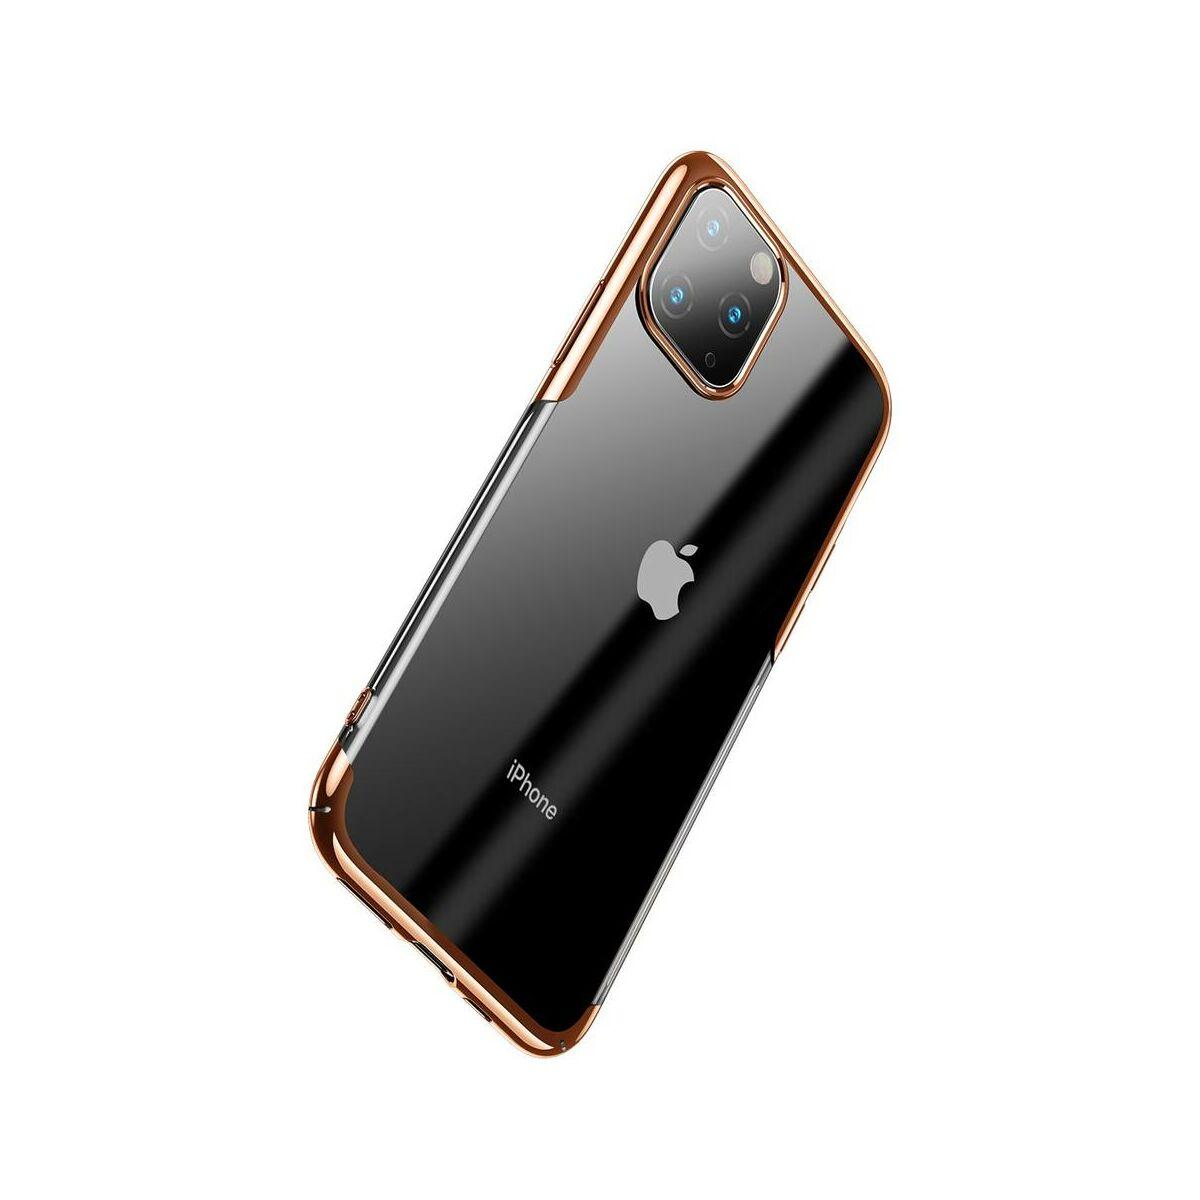 Baseus iPhone 11 Pro Max tok, Glitter, arany (WIAPIPH65S-DW0V)